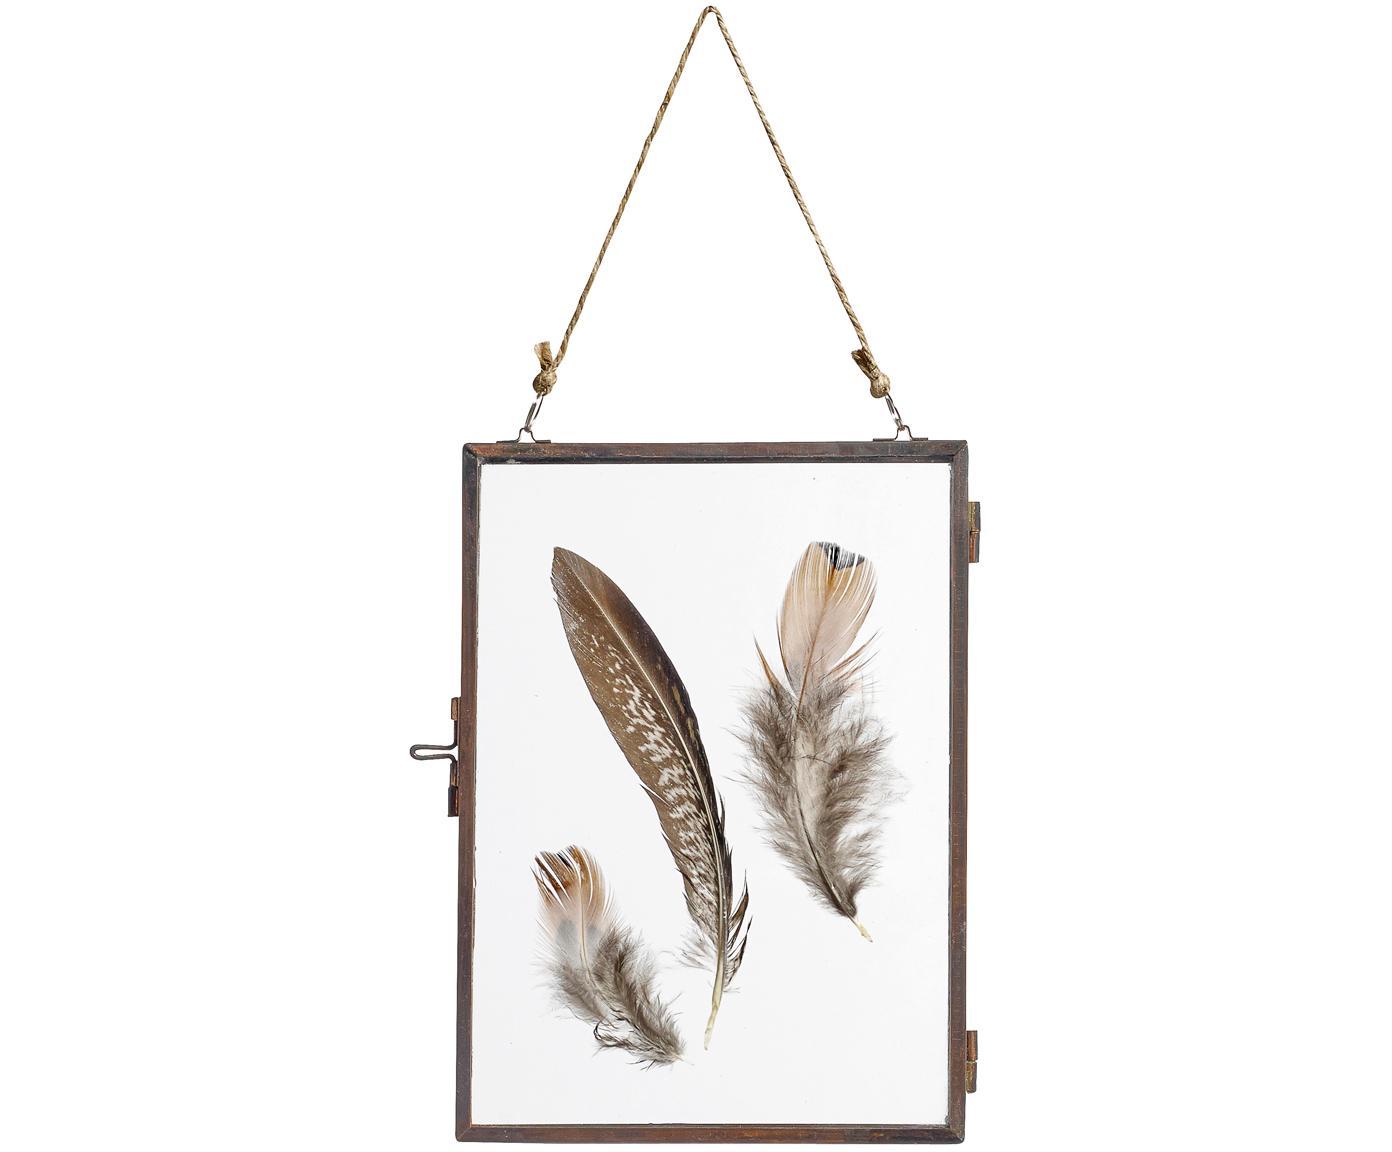 Cornice Pioros, Cornice: metallo, rivestito, Rame, trasparente, 13 x 18 cm